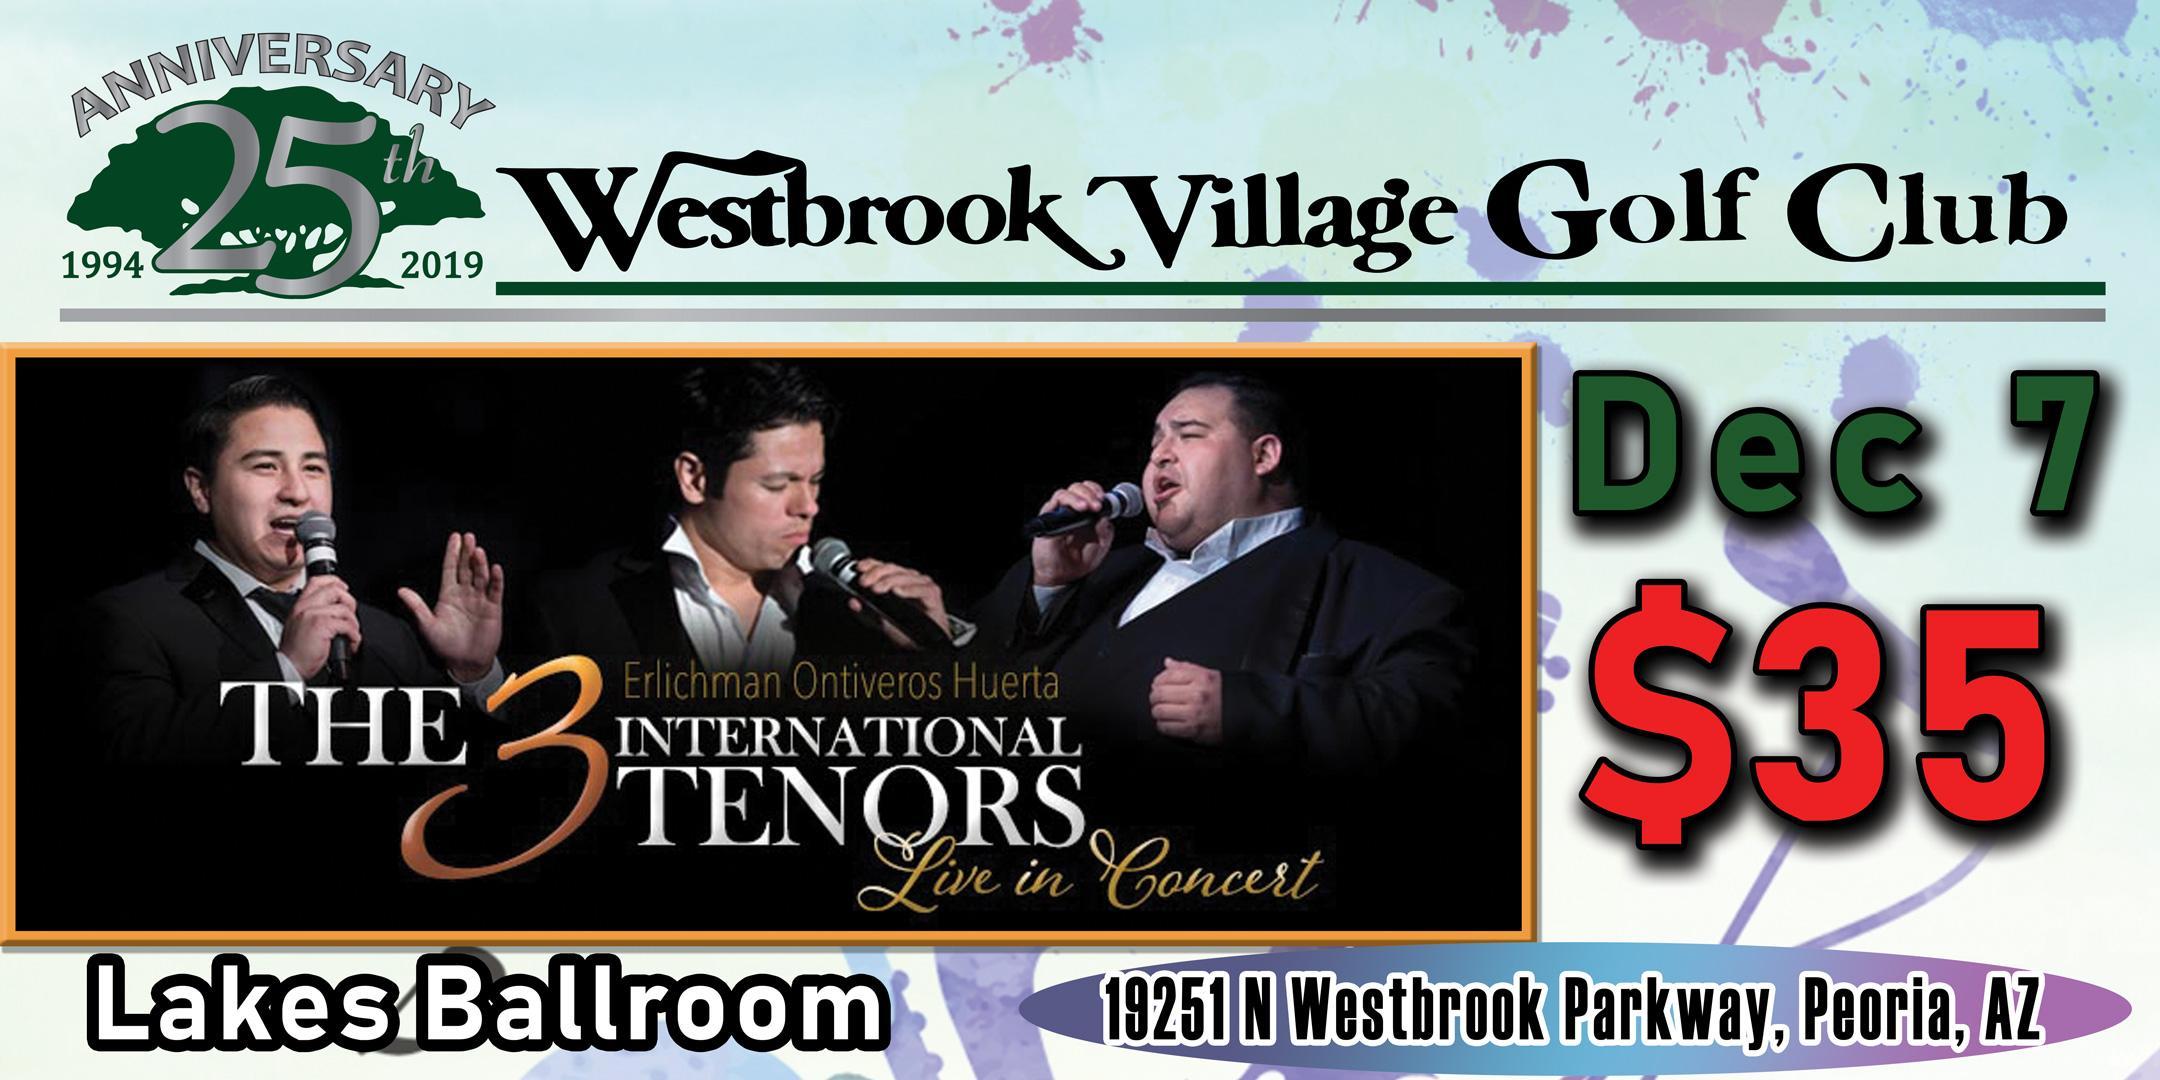 The 3 International Tenors at Westbrook Village Golf Club